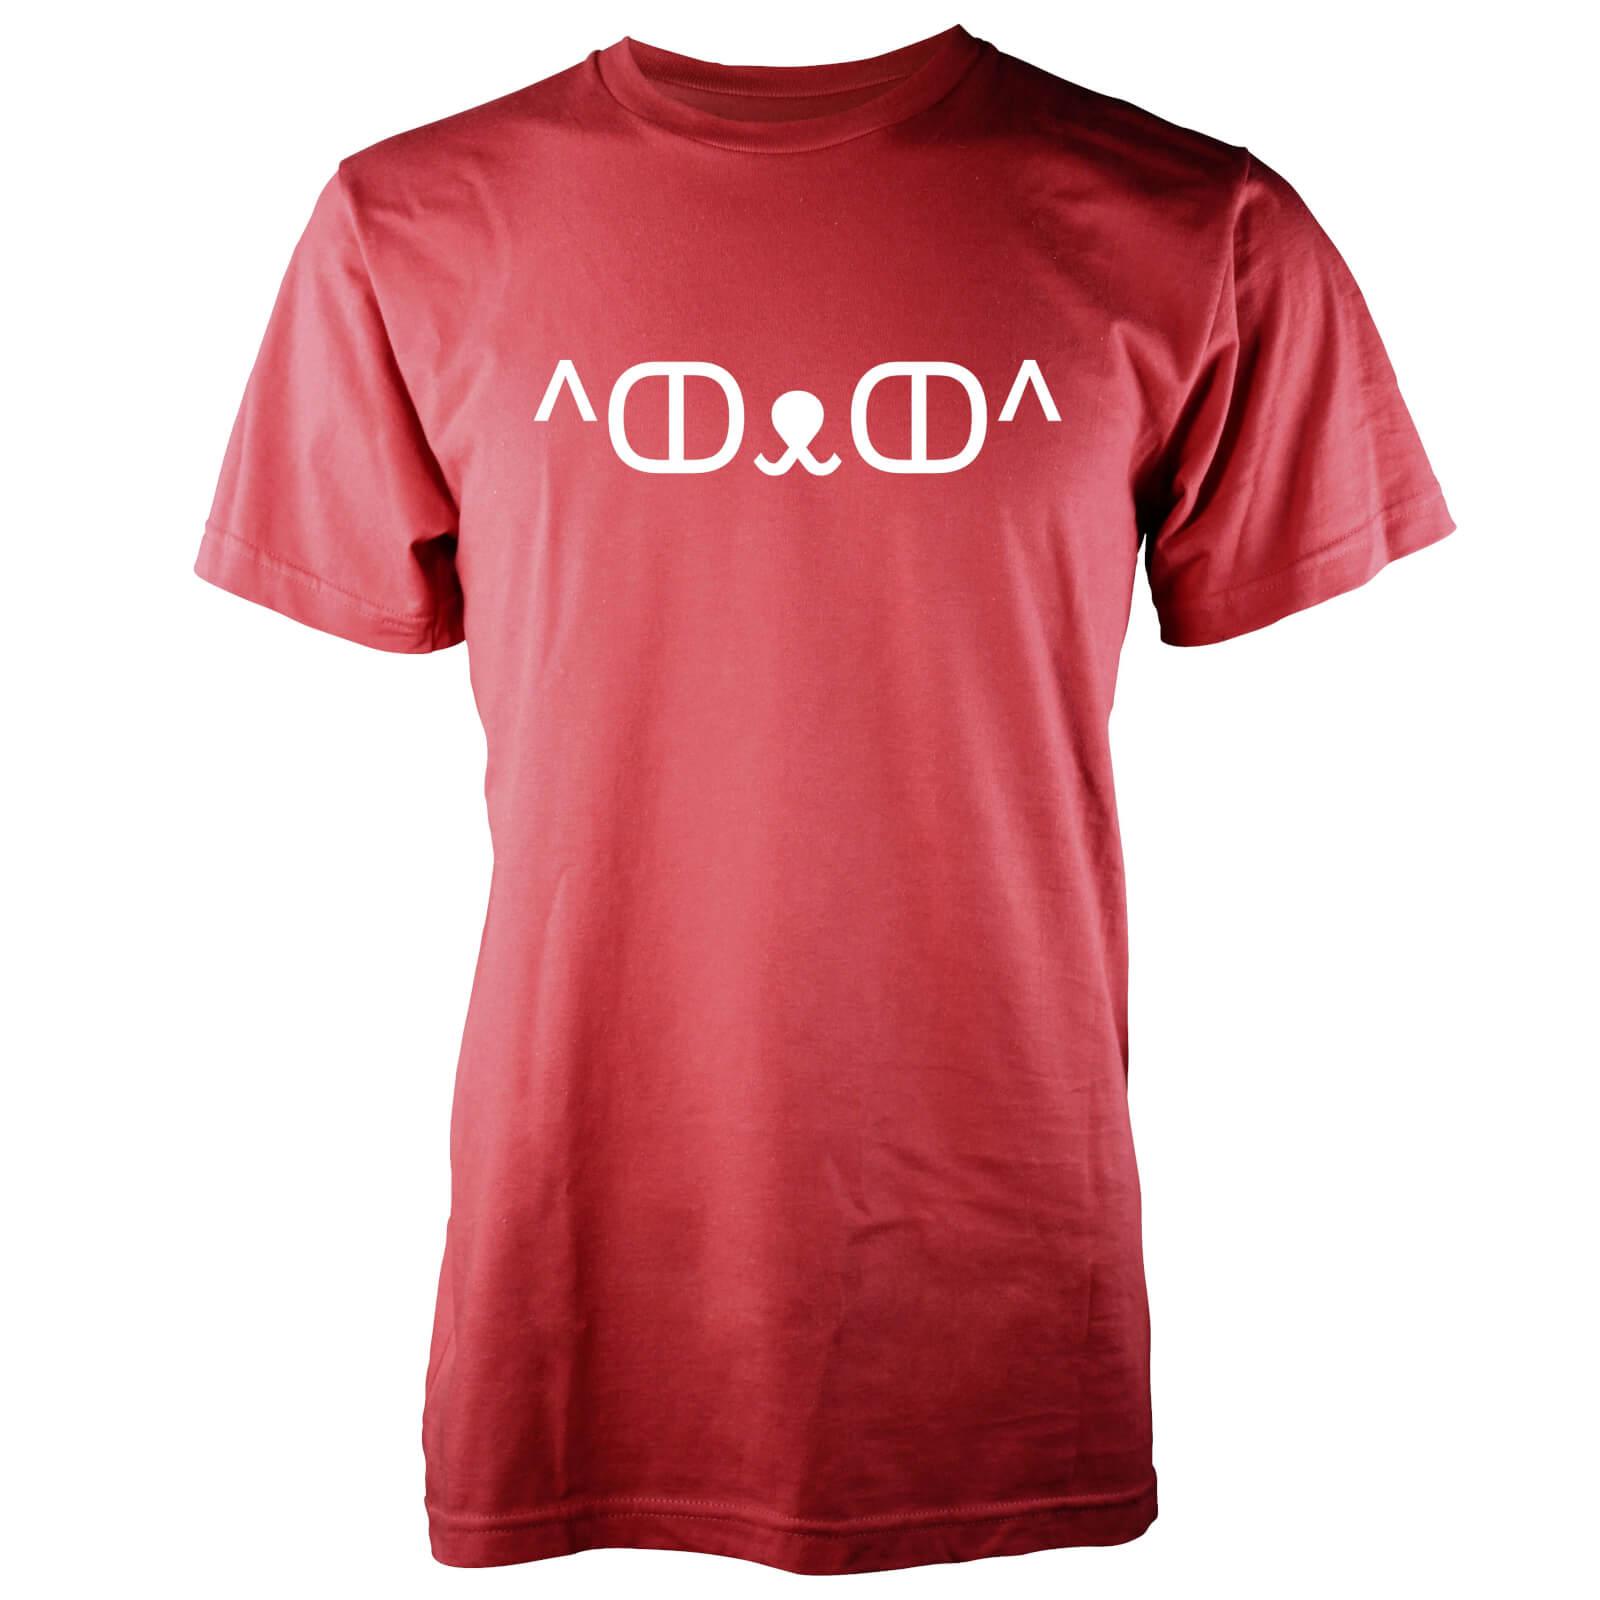 T-Junkie Men's Cute Cat Jemoticon T-Shirt - L - Red